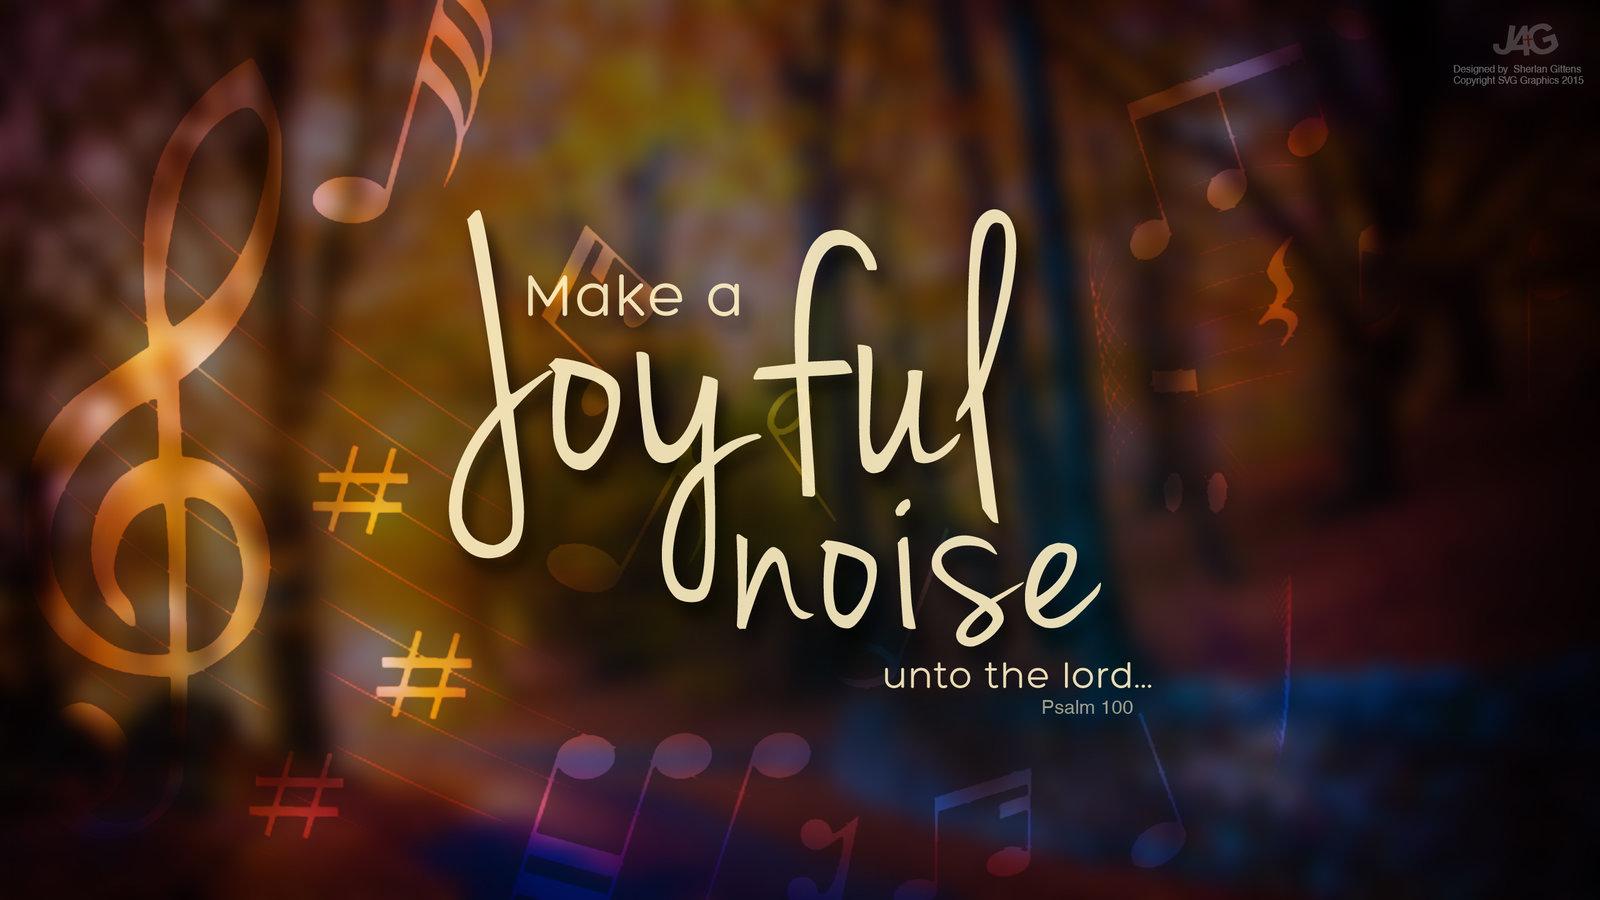 make_a_joyful_noise_by_svggraphics-d933ax3.jpg